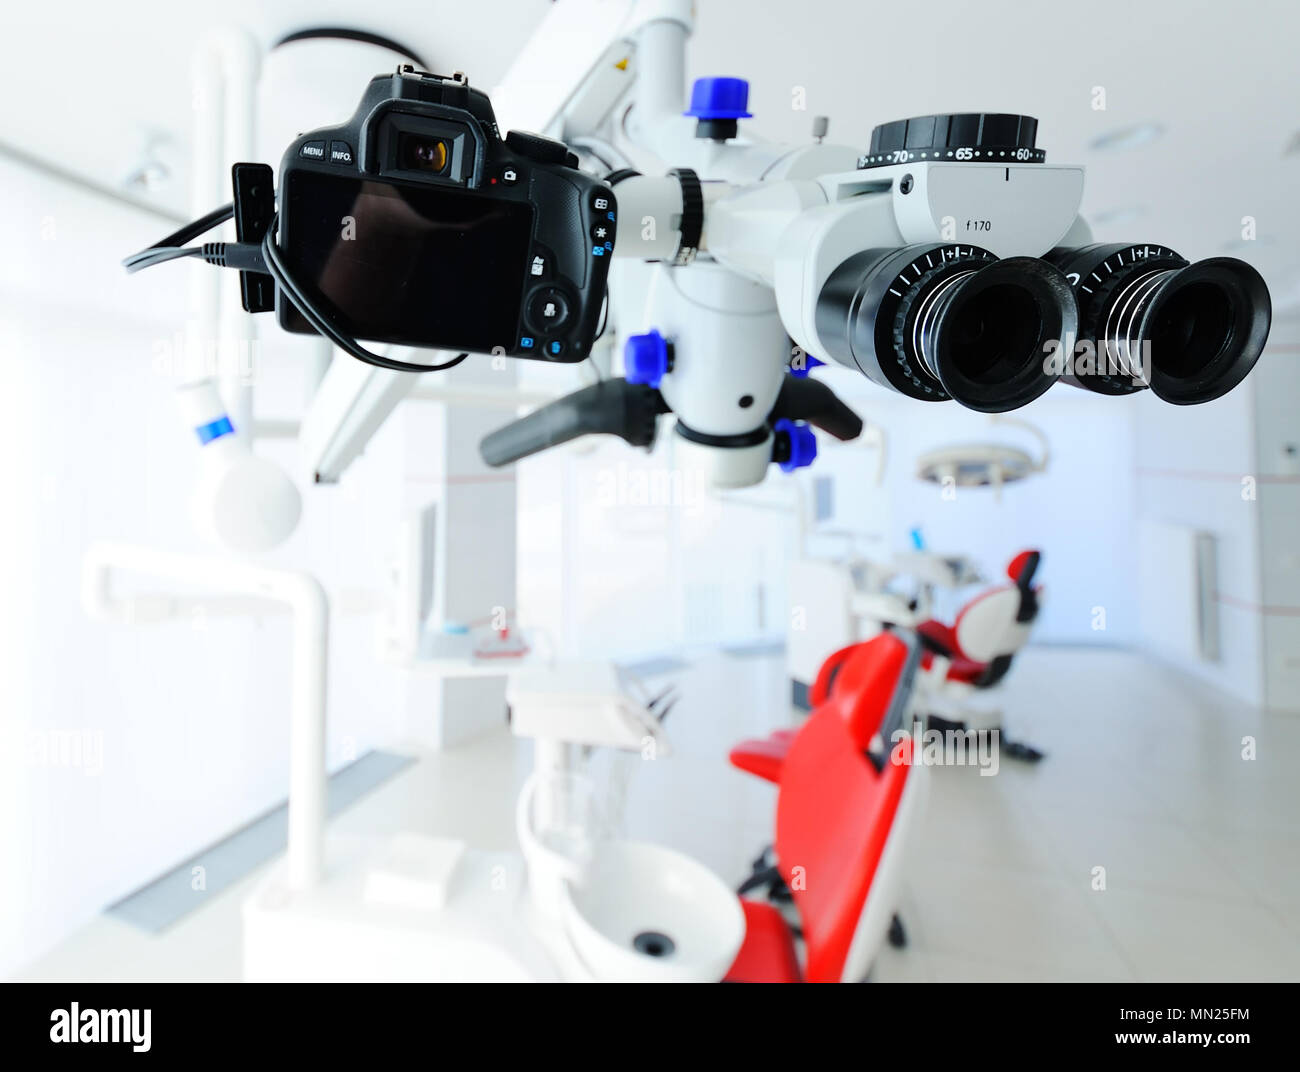 dental microscope closeup - Stock Image